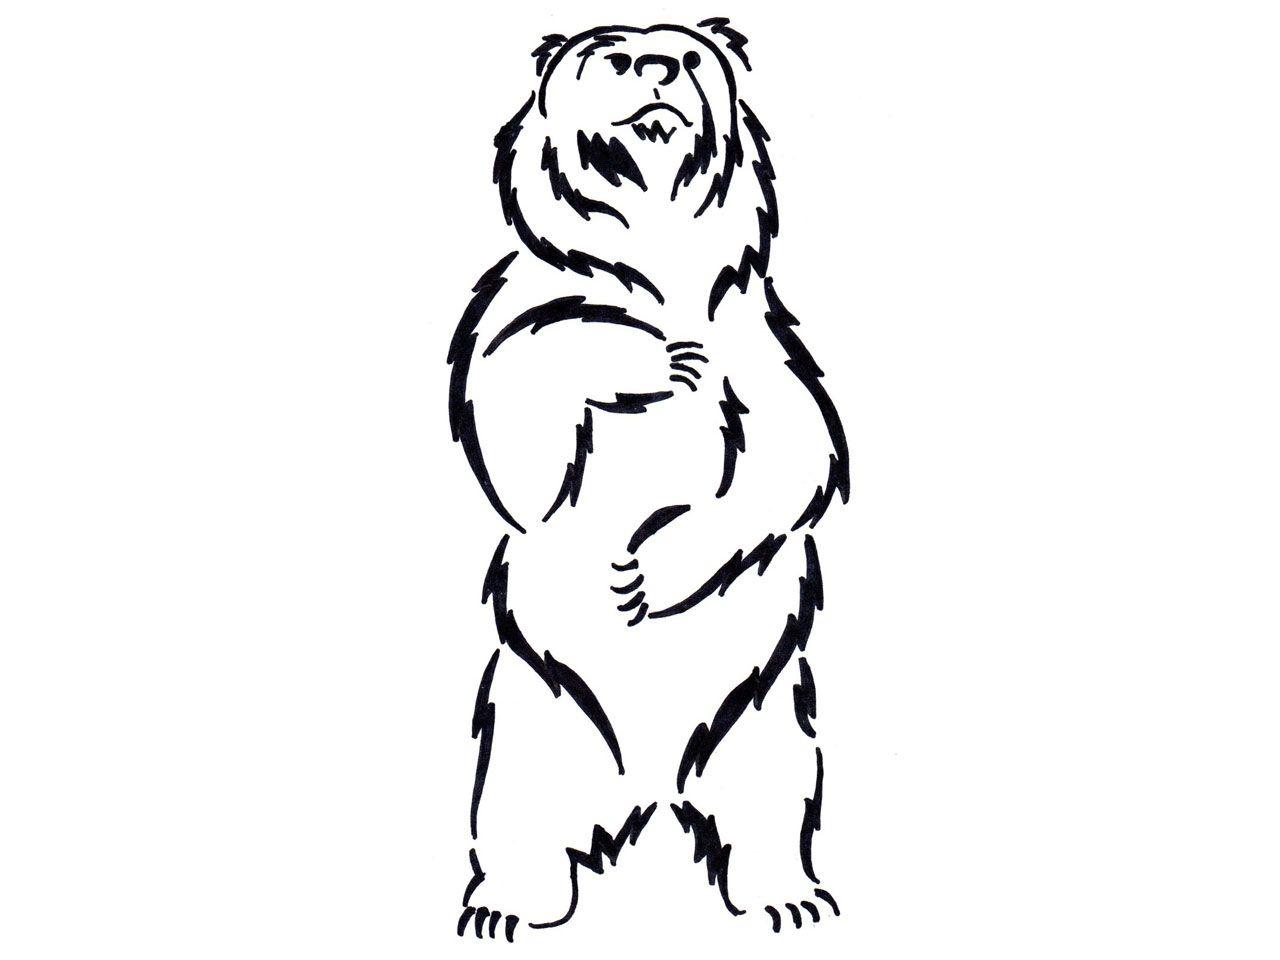 Balck bear drawing clipart clip download Standing Black Bear Drawing | Clipart Panda - Free Clipart Images ... clip download